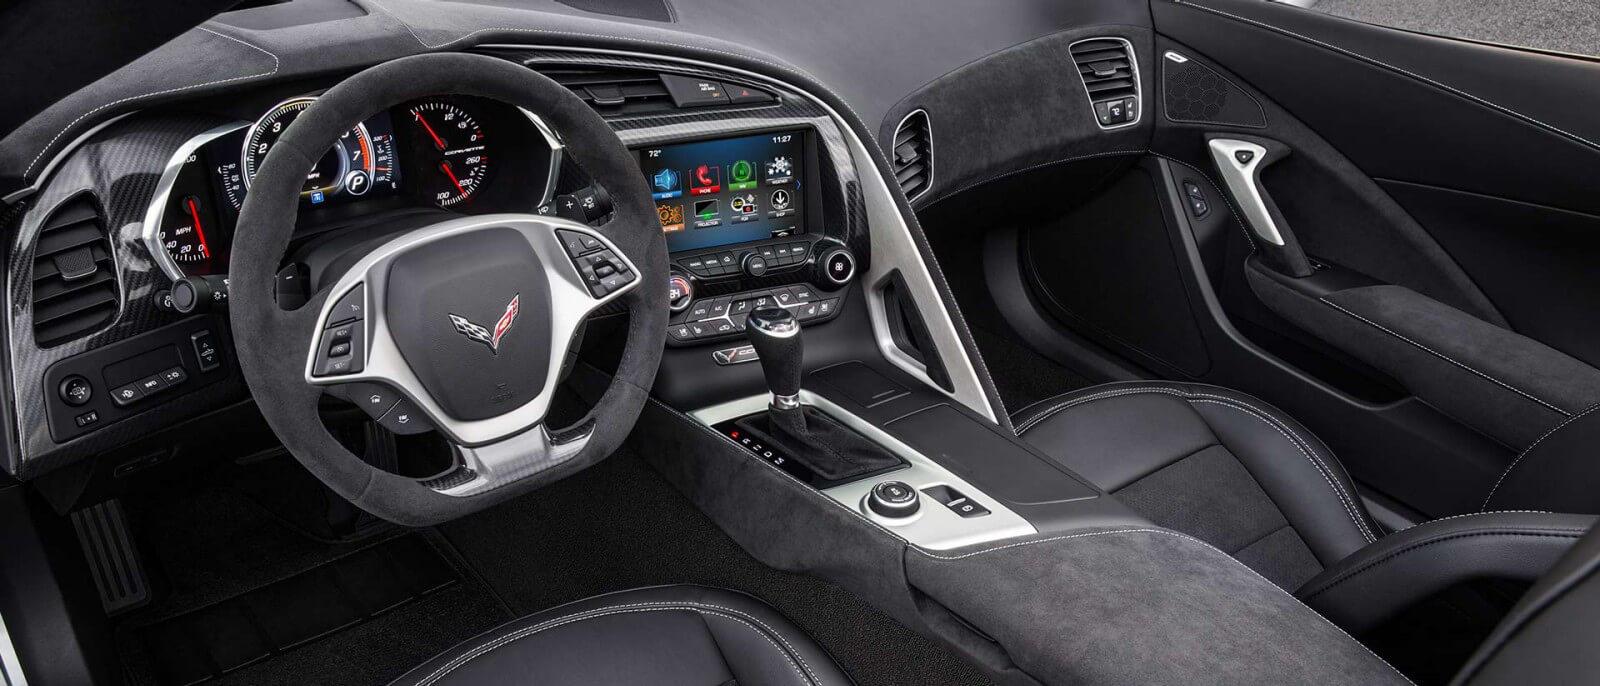 2017 Chevrolet Corvette dashboard